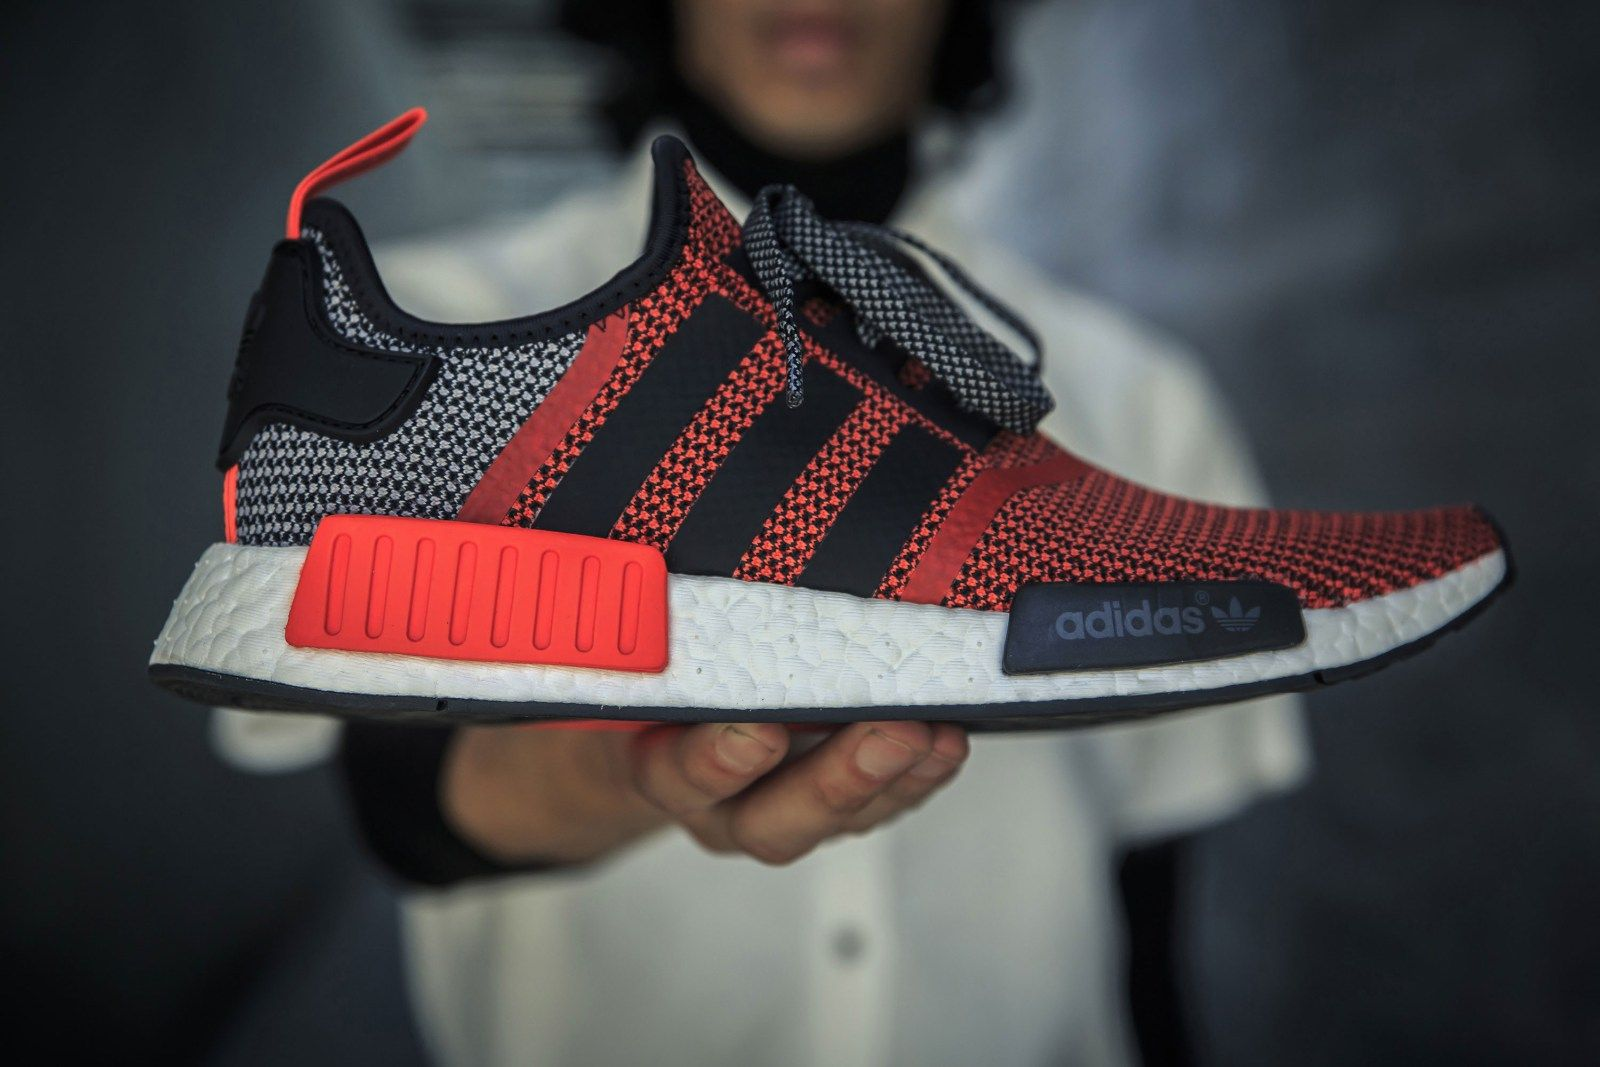 Adidas Future